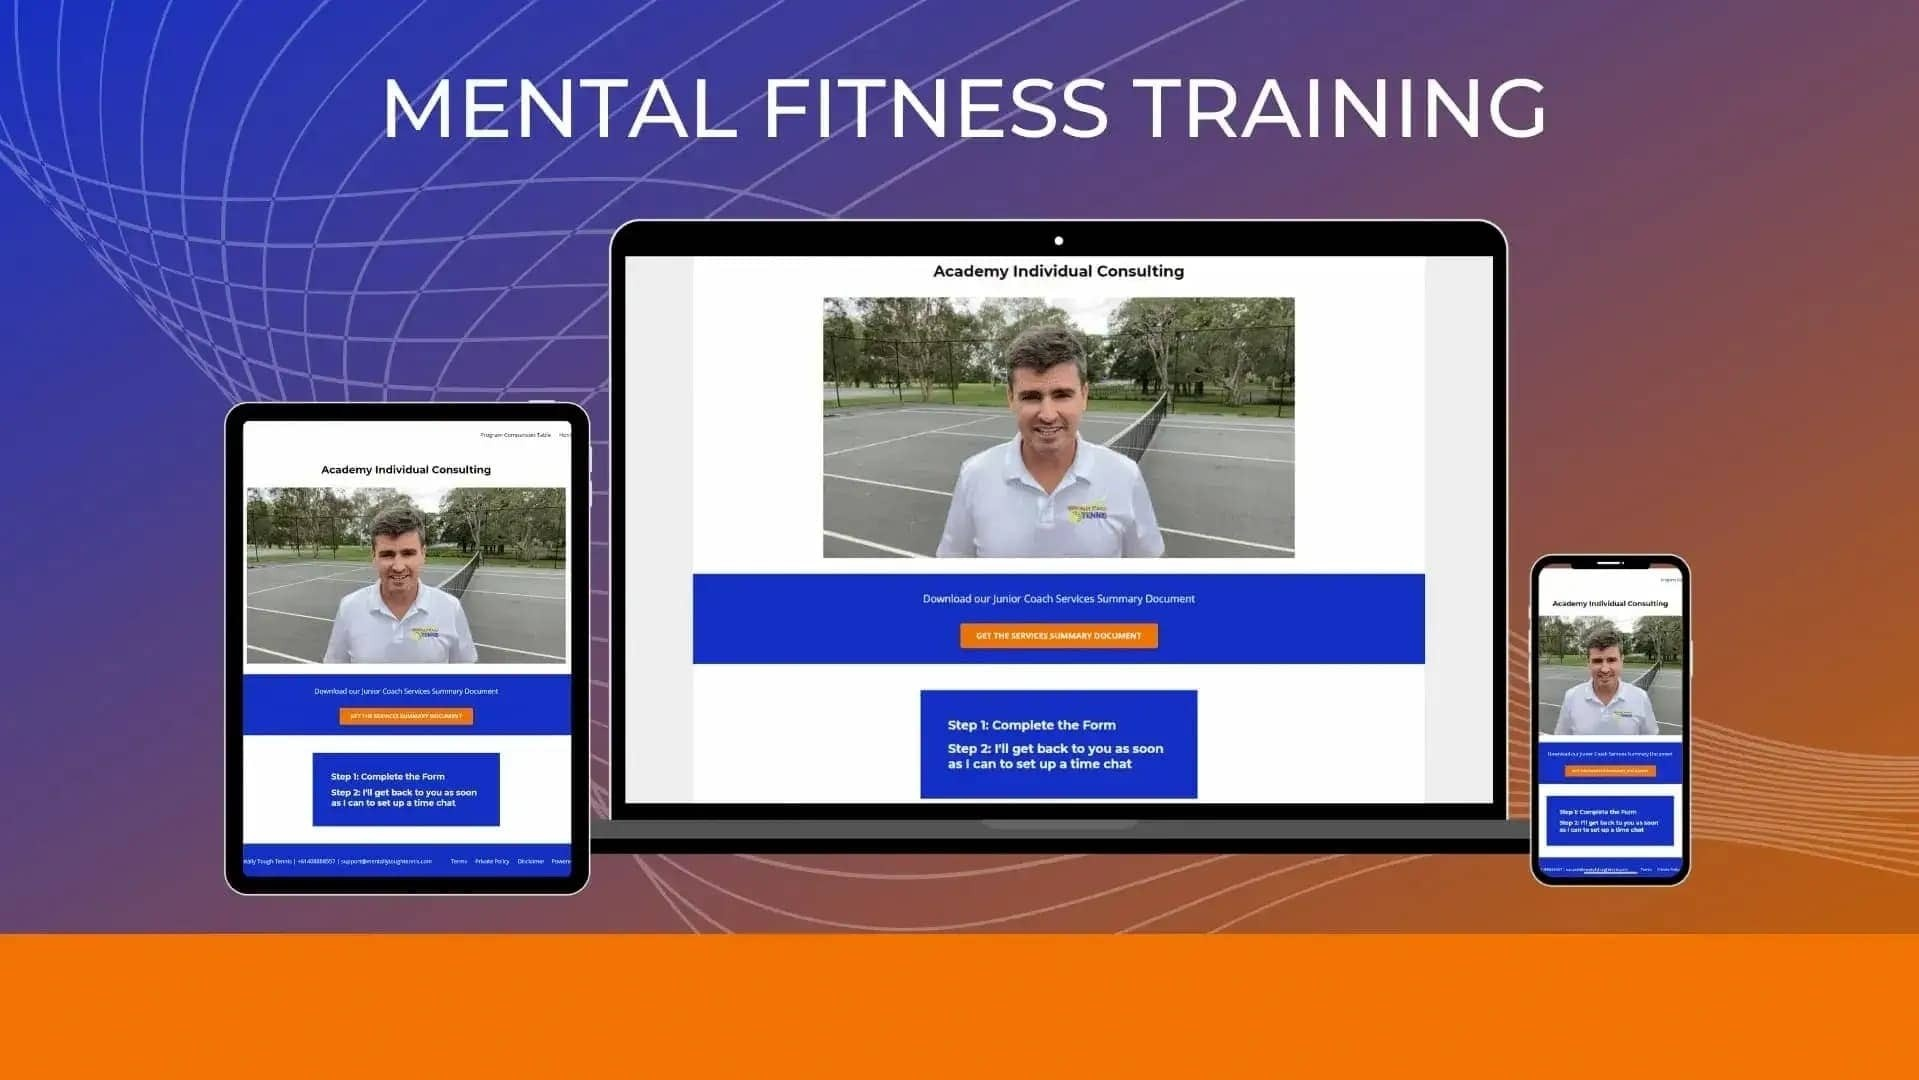 Mental Fitness Training